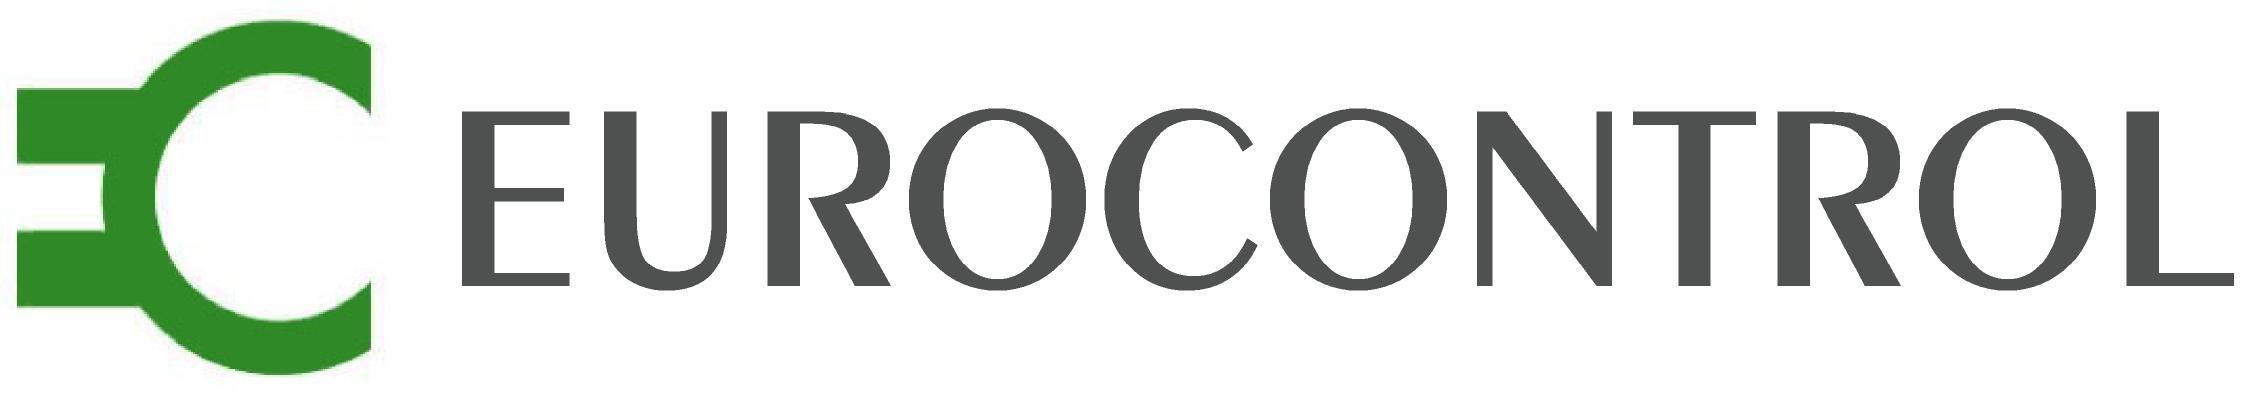 logo-EUROCONTROL